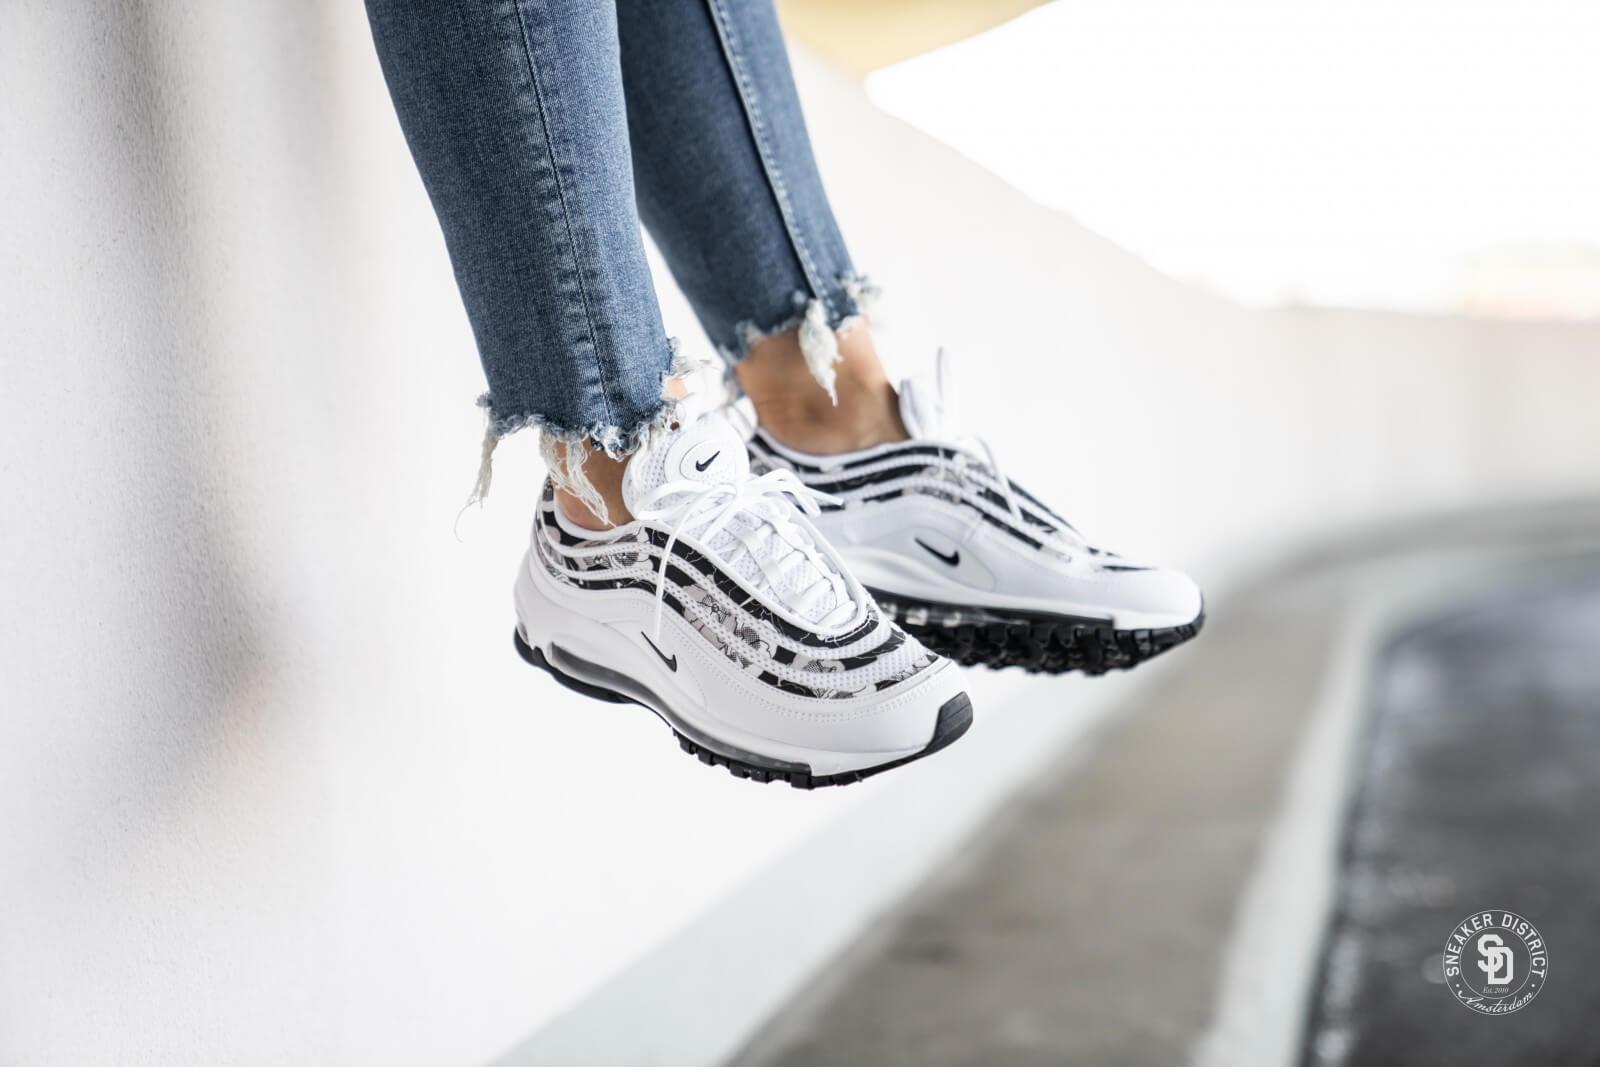 Nike Women's Air Max 97 SE White/Black